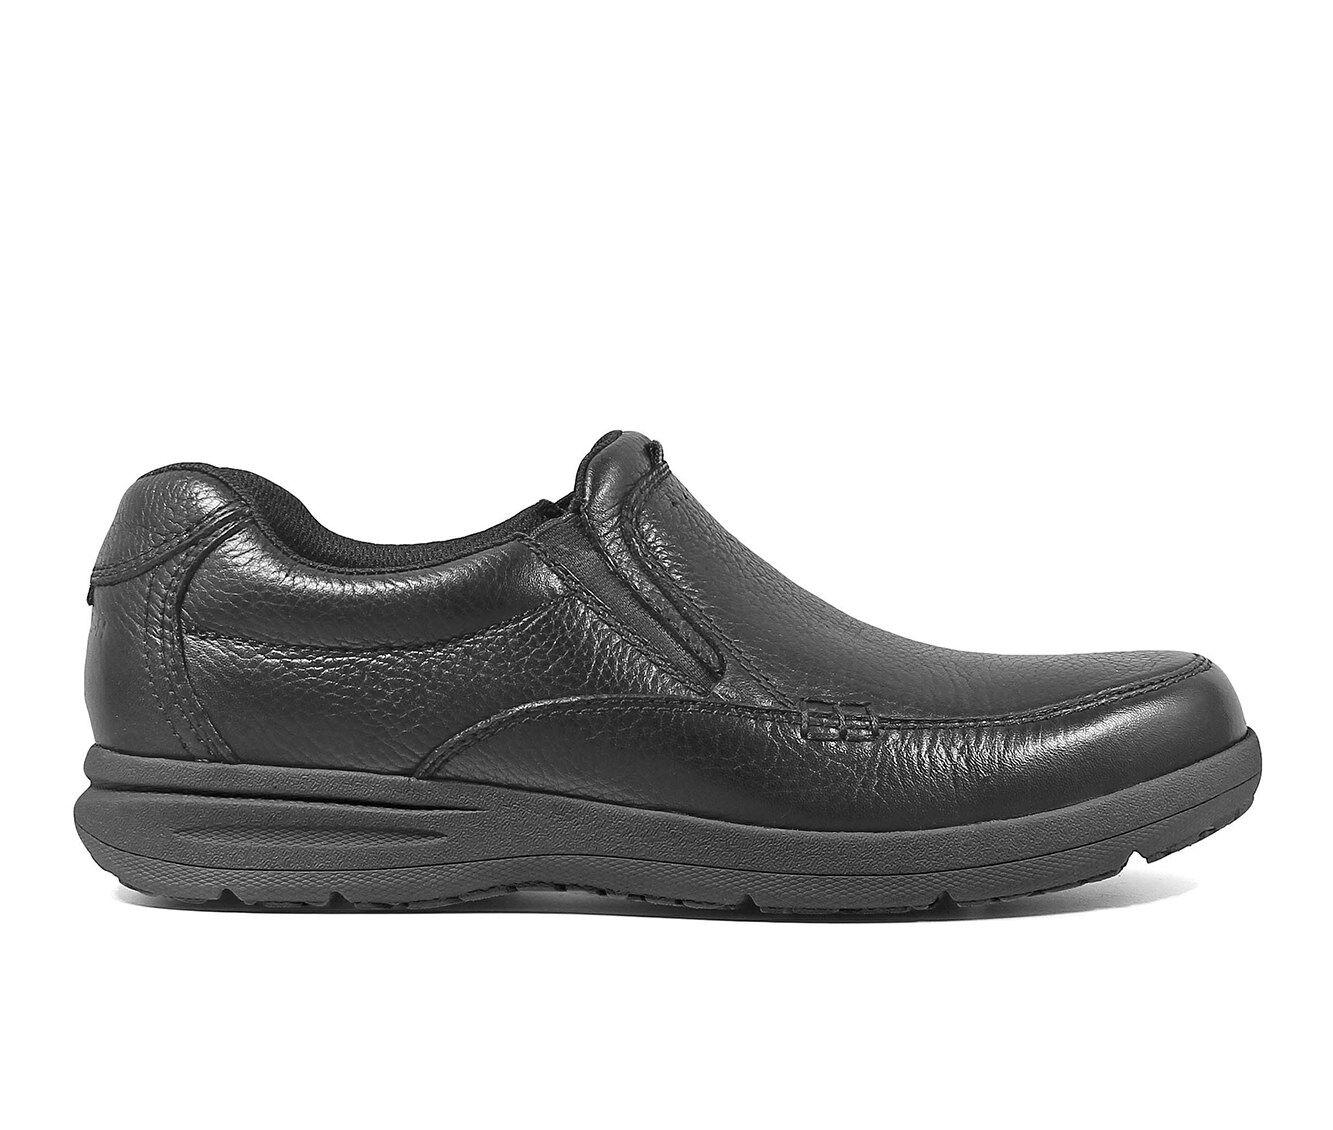 uk shoes_kd1734